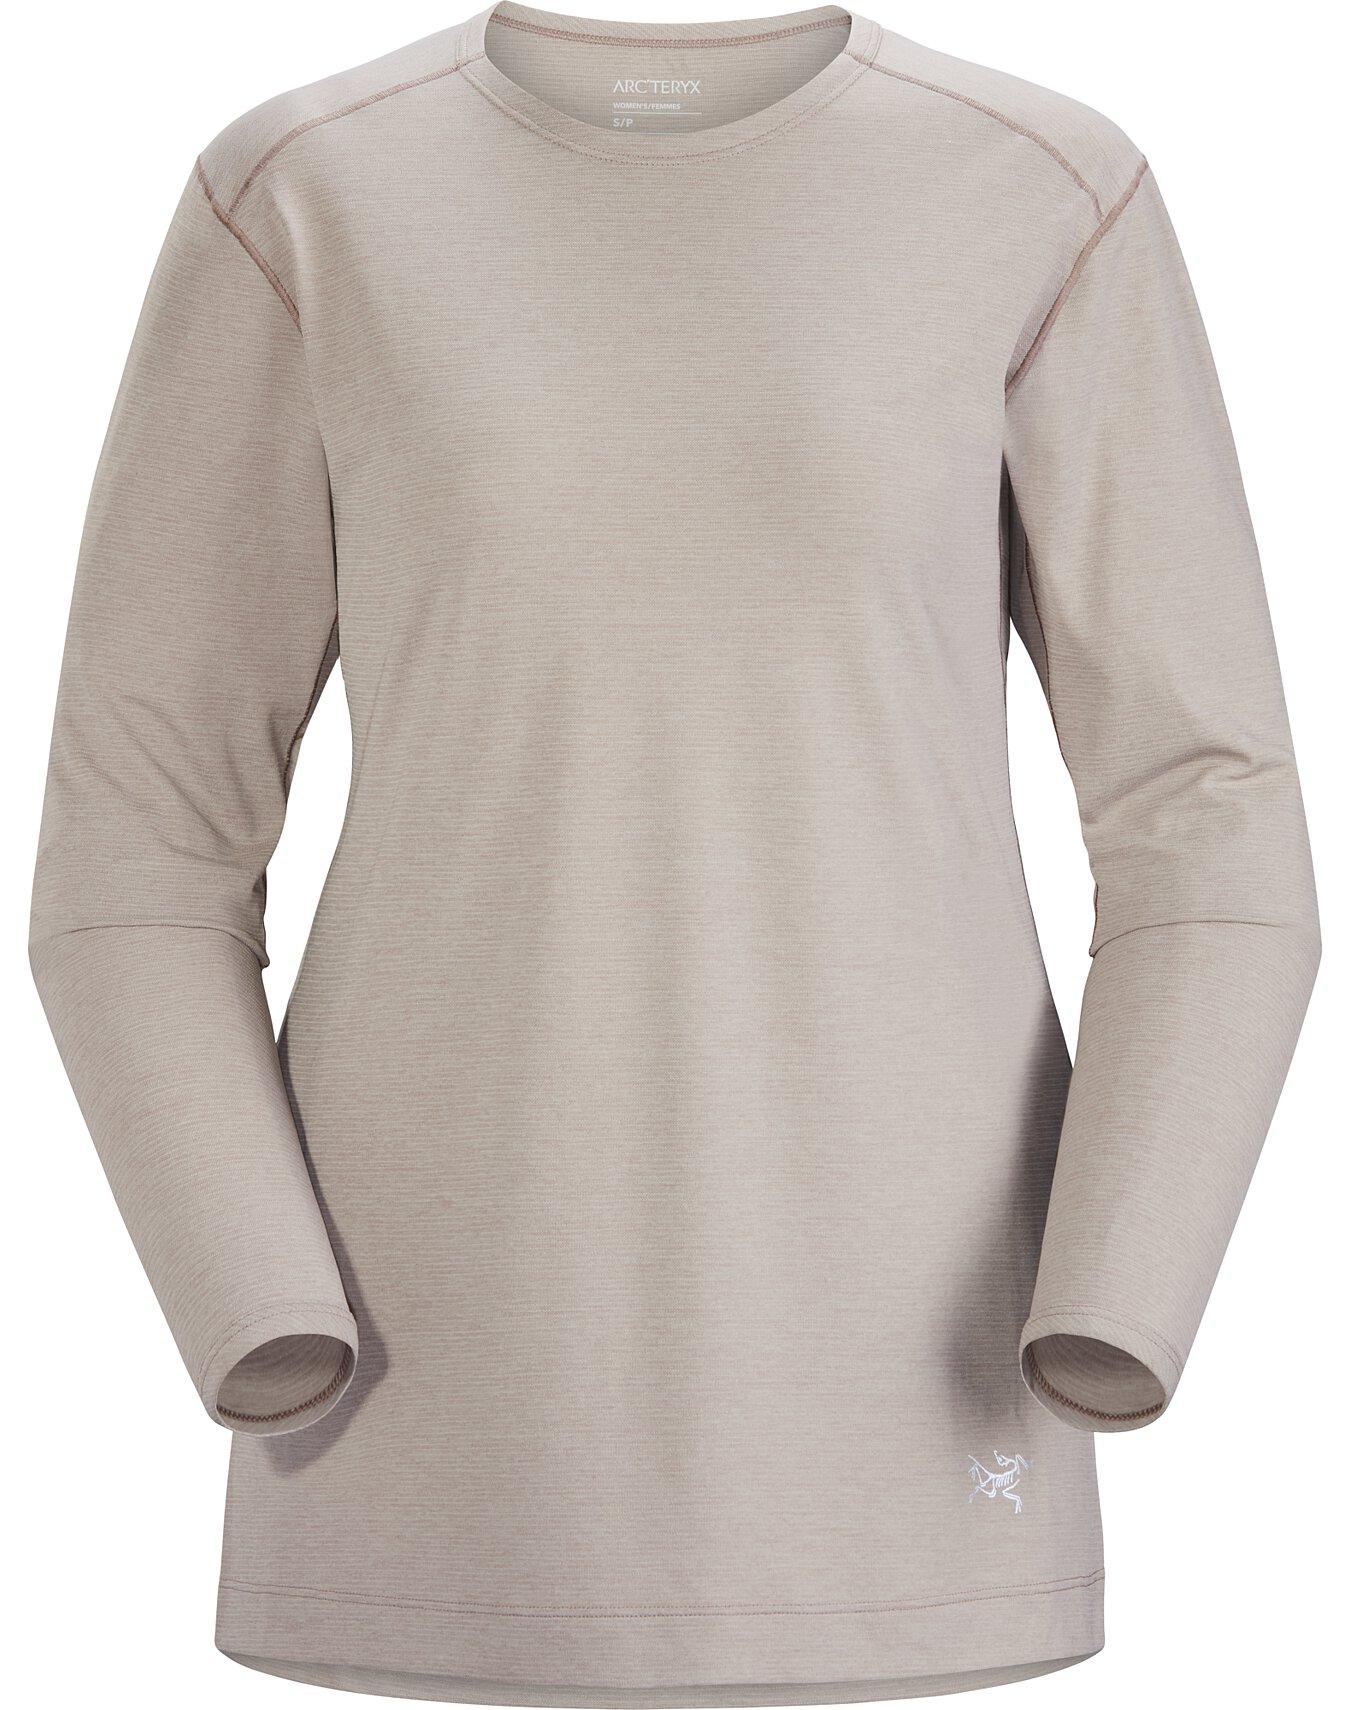 Quadra Crew Neck Shirt LS Women's